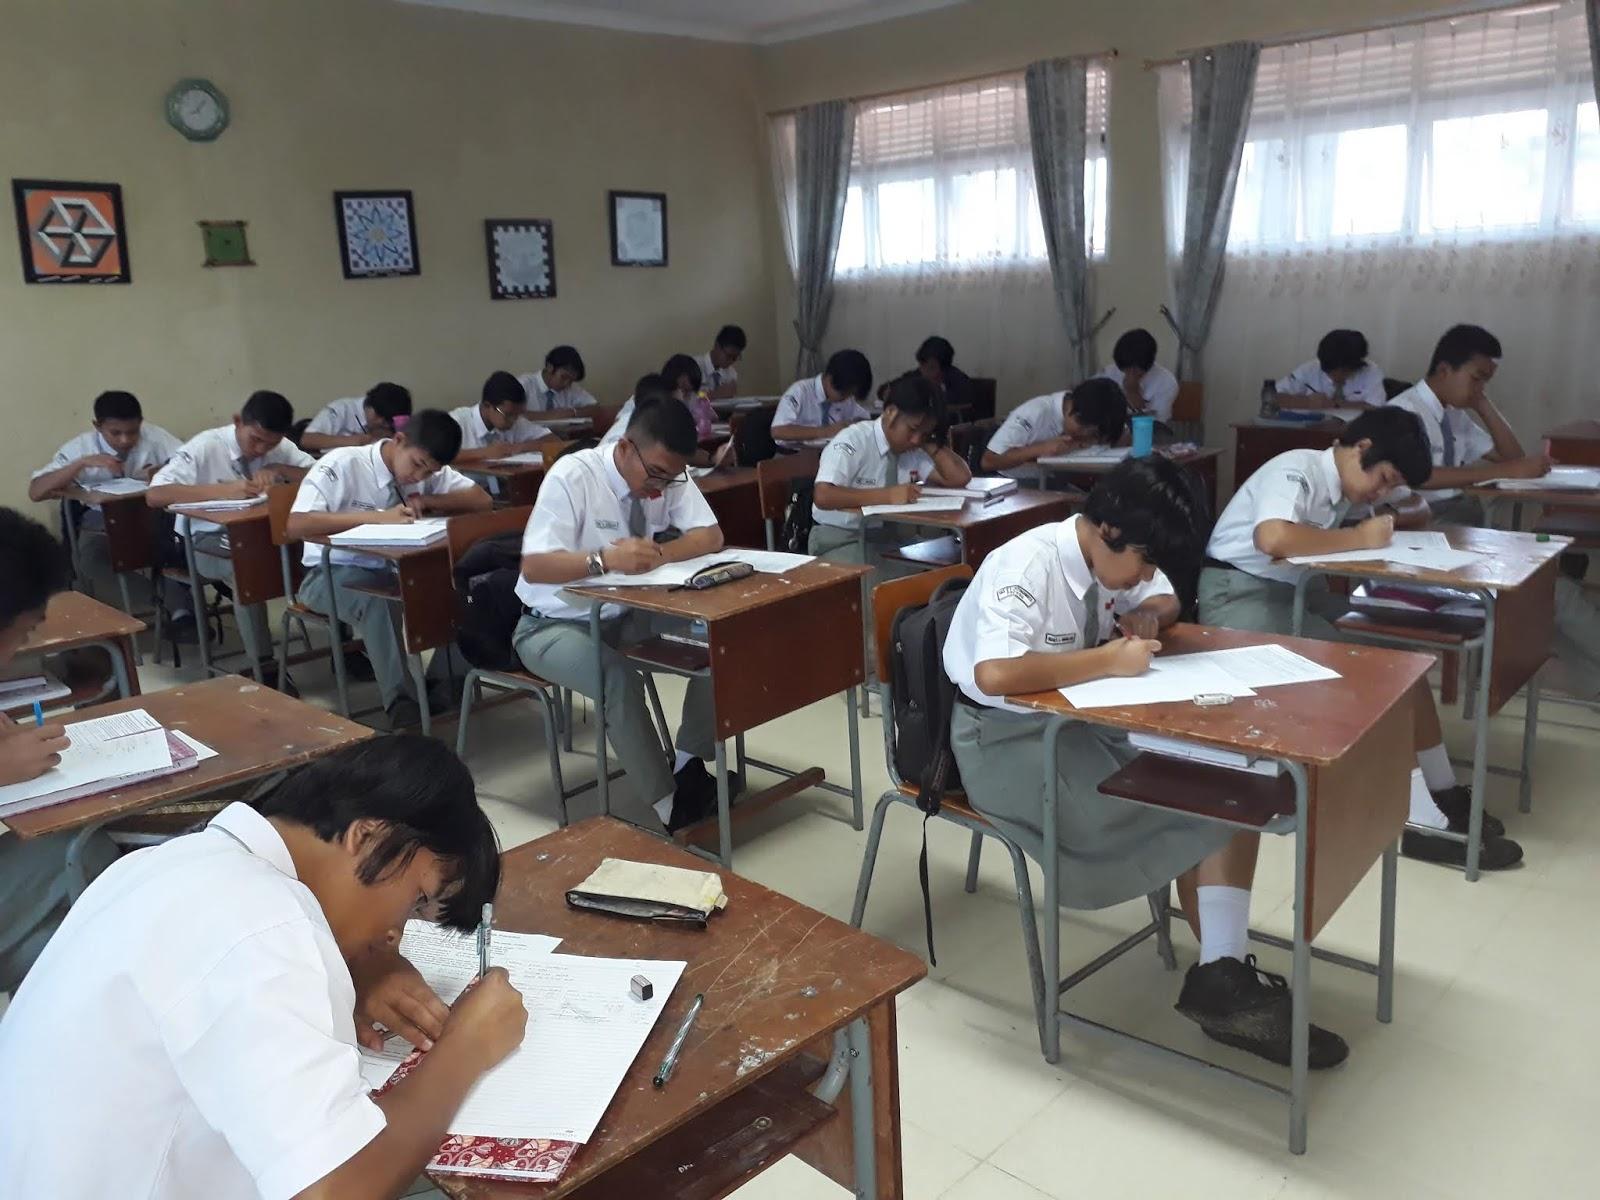 Belajar Membuat Penelitian Tindakan Kelas (PTK): Hasil Penelitian dan Penarikan Kesimpulan PTK